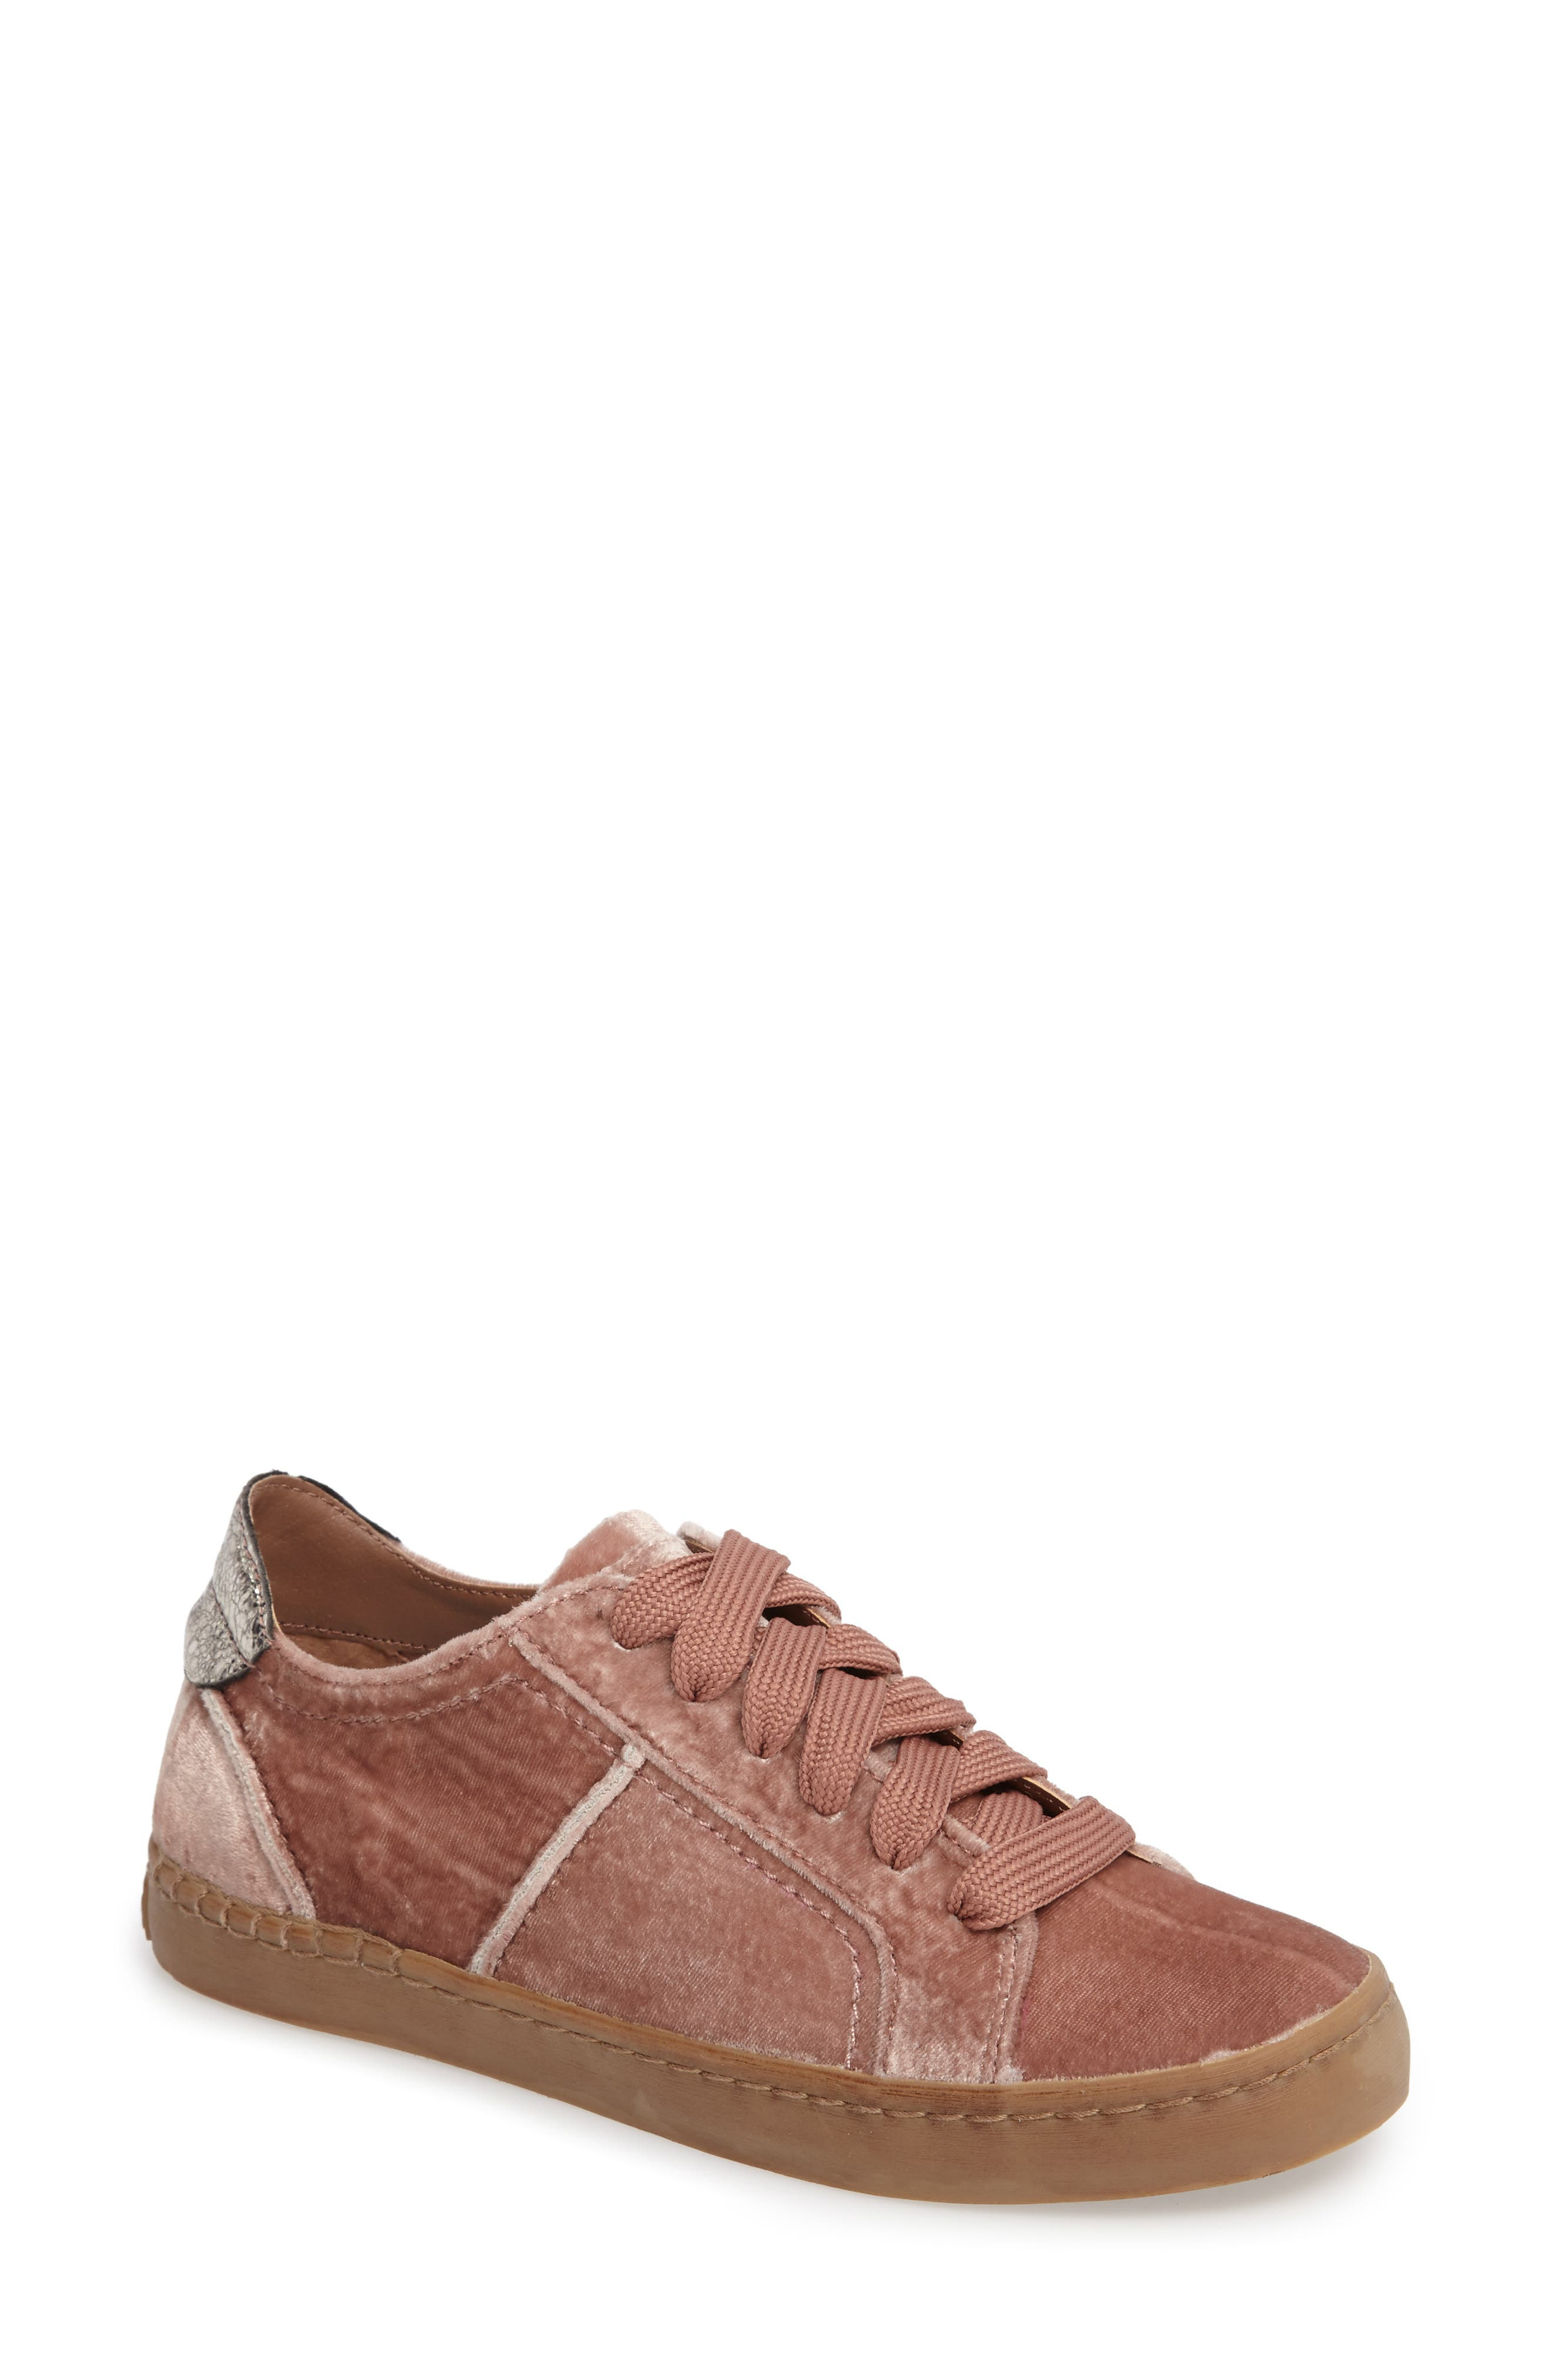 Alternate Image 1 Selected - Dolce Vita 'Zalen' Sneaker (Women)